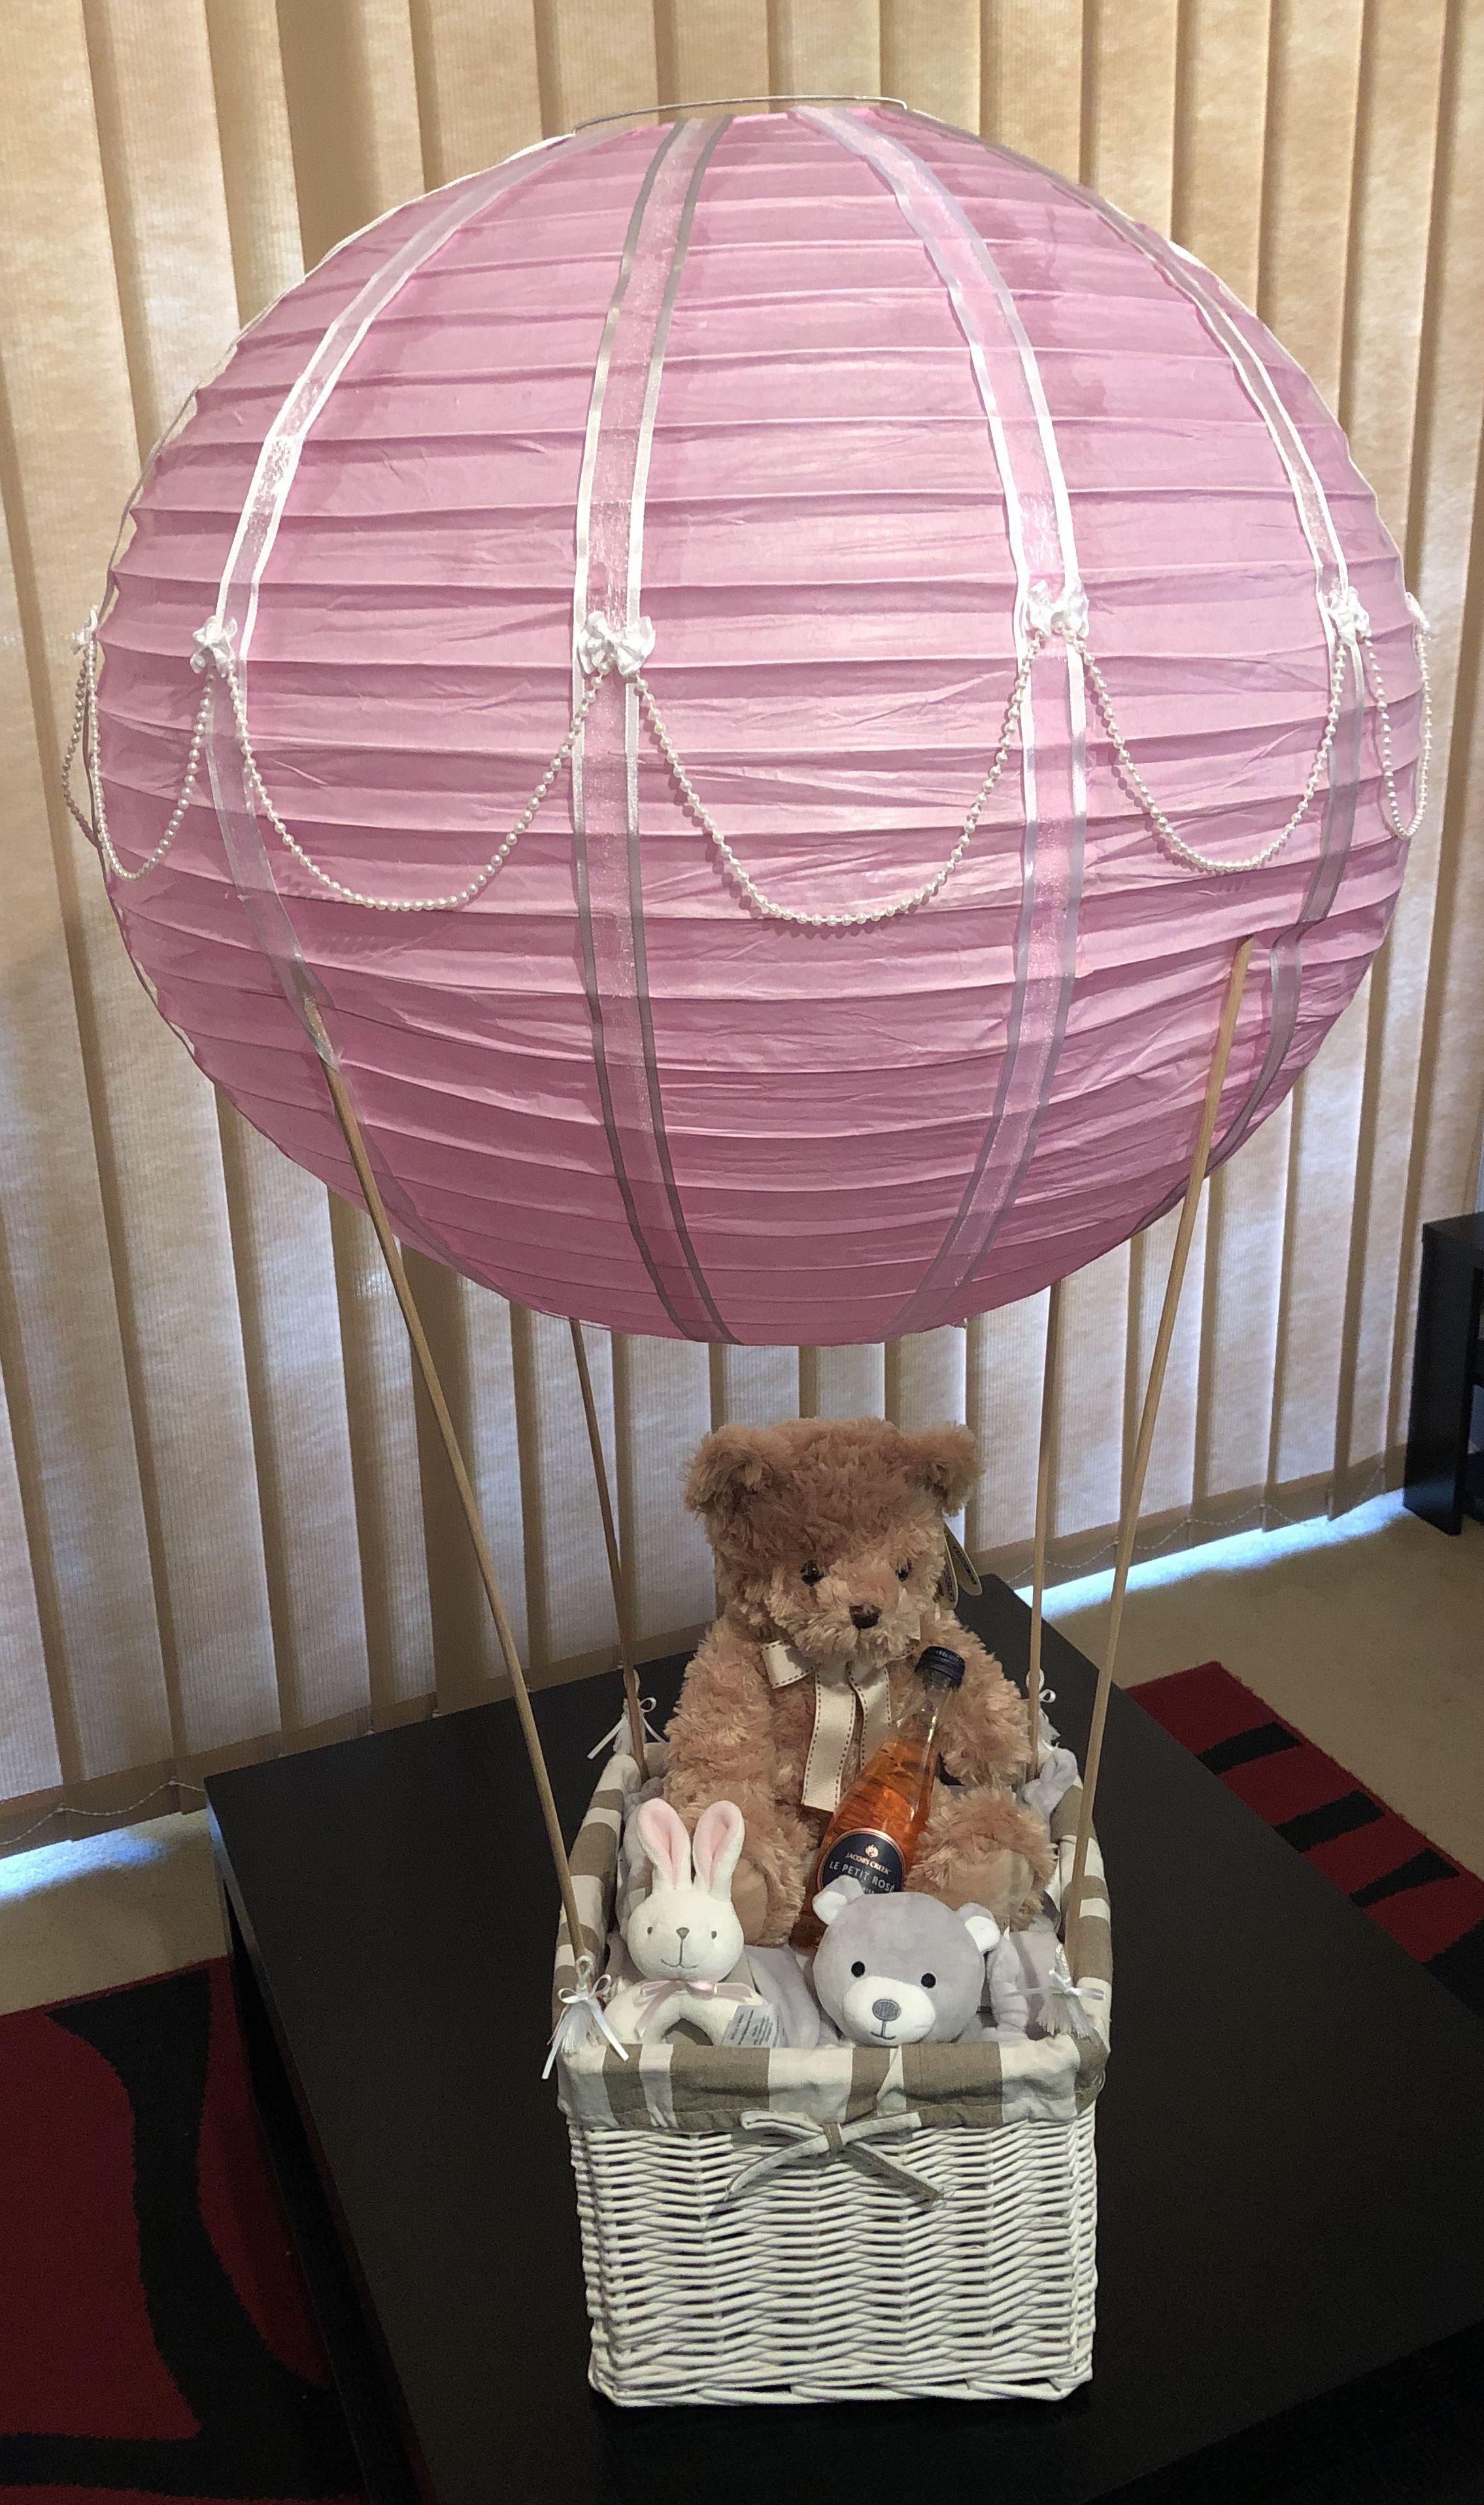 Hot Air Balloon Gift Basket : balloon, basket, Balloon, Basket, Shower,, Gift,